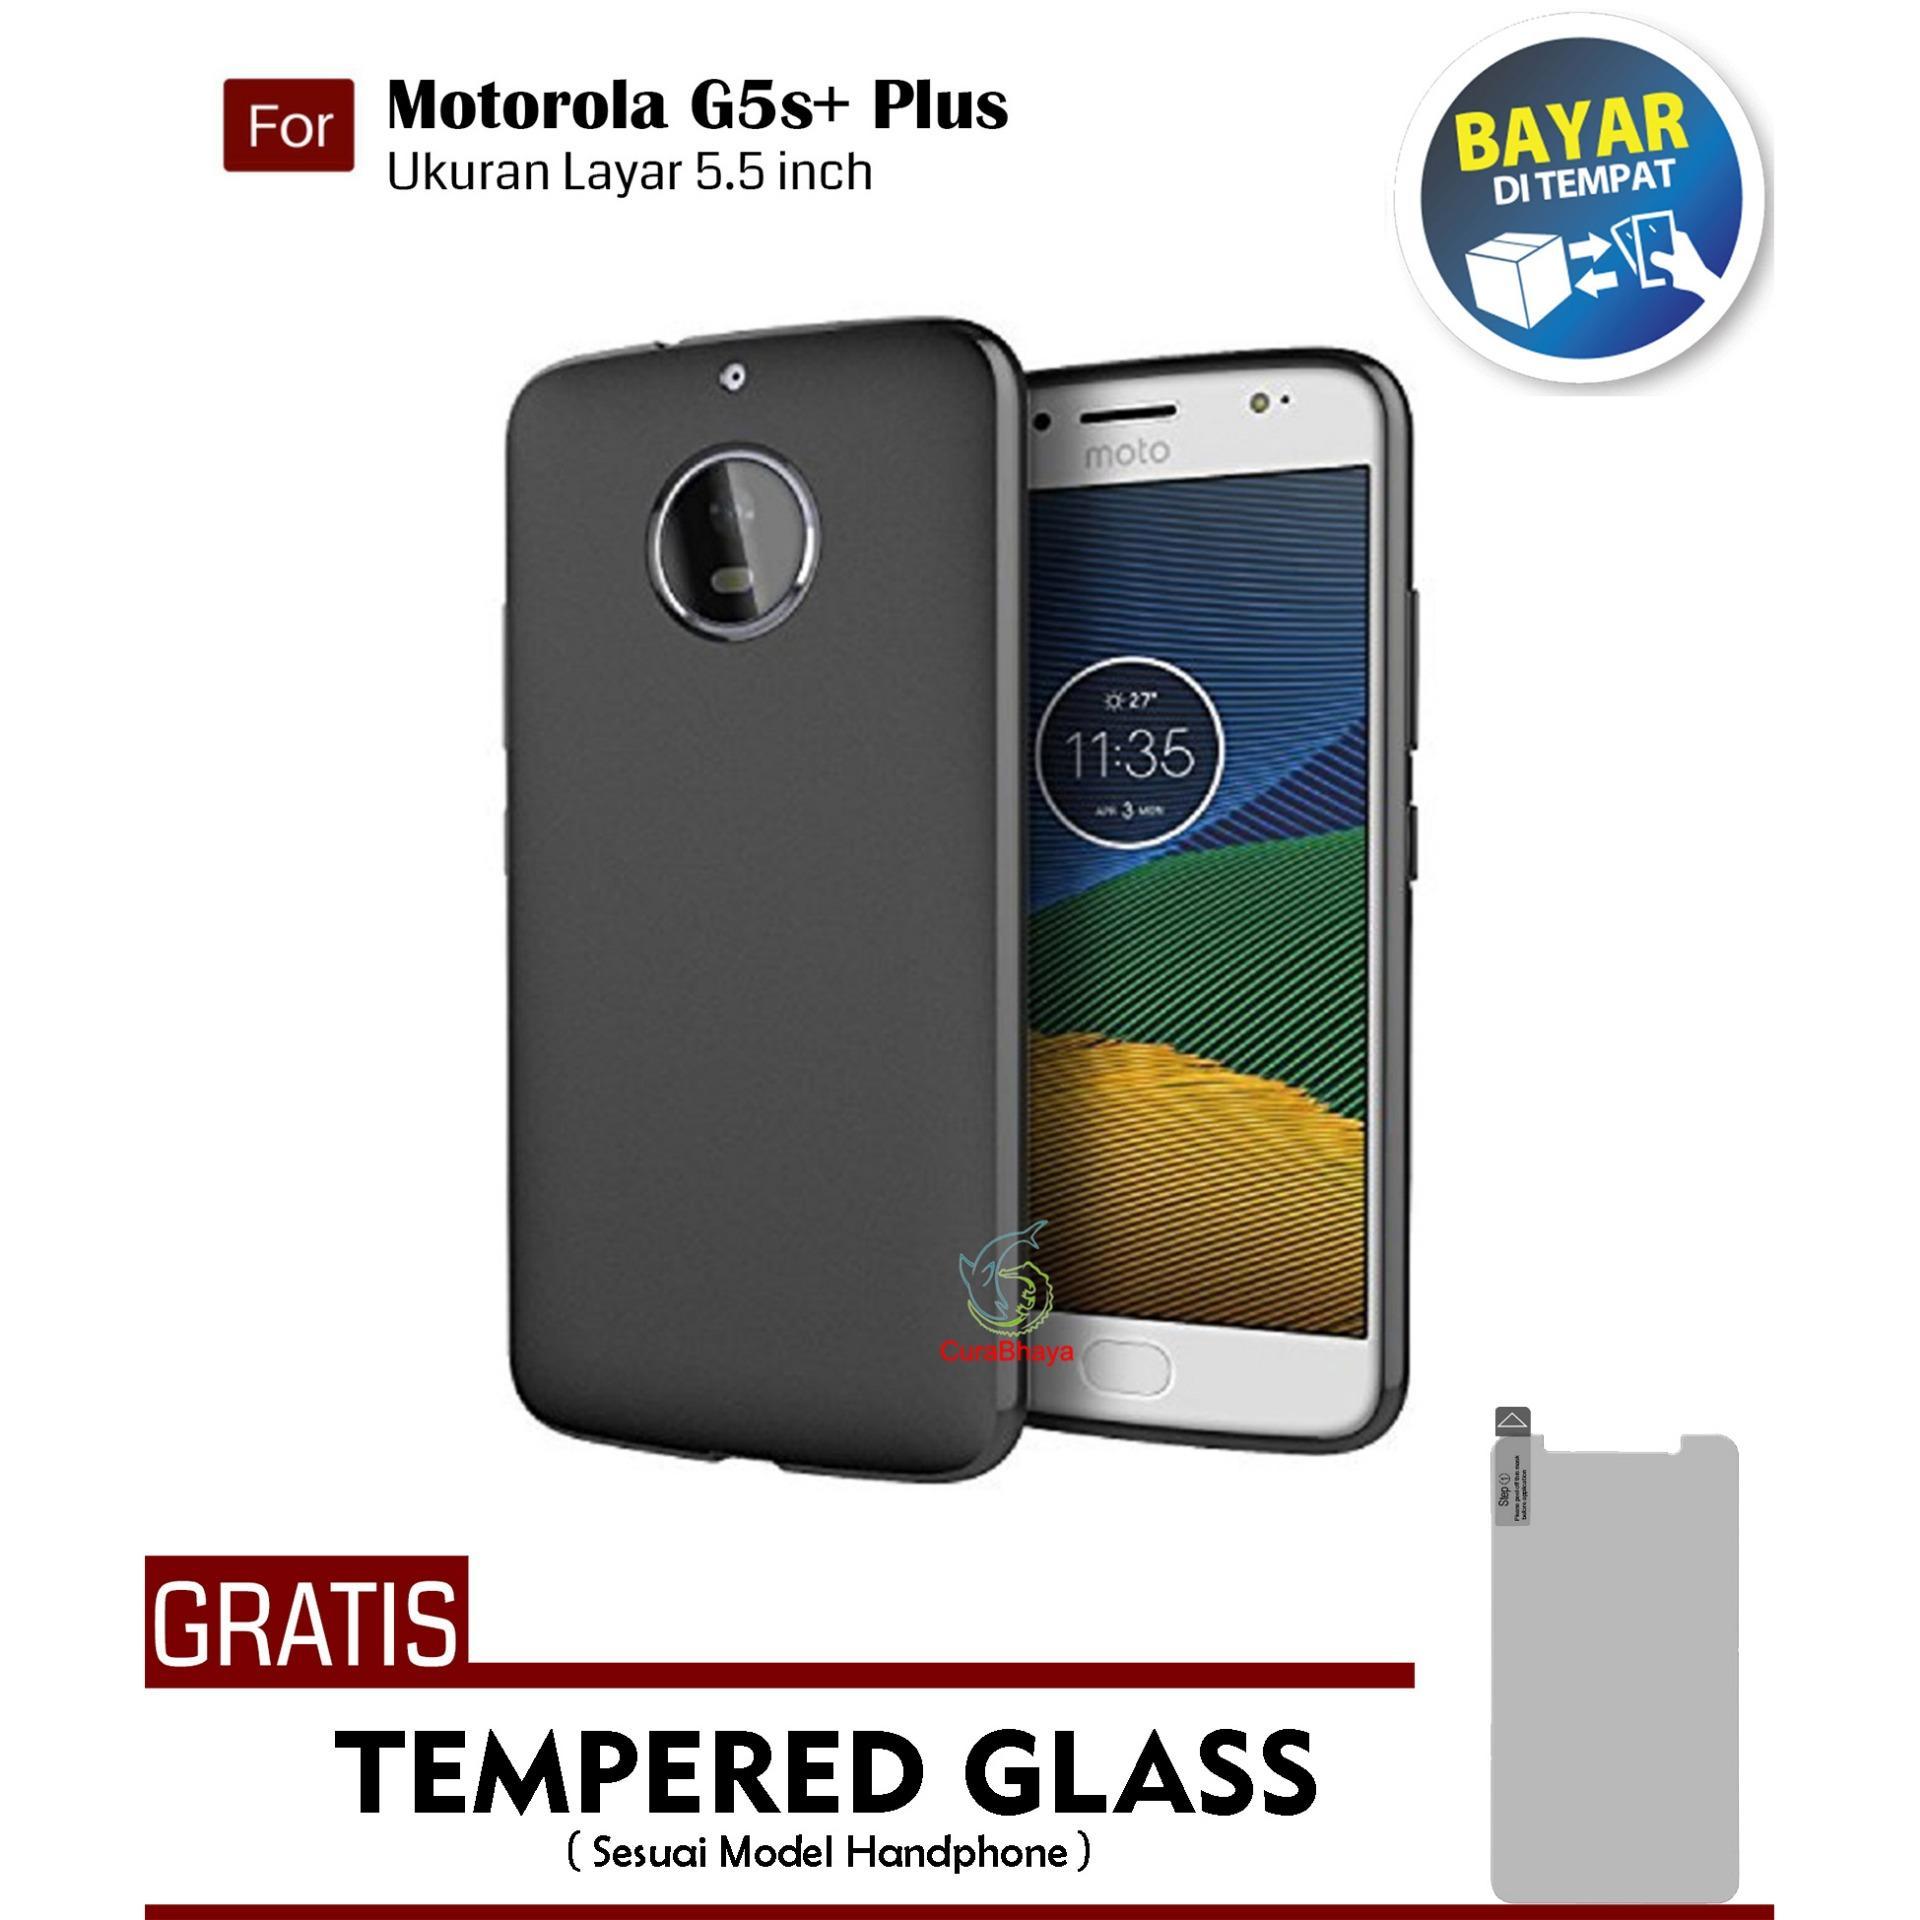 Jual Produk Softcase Motorola G5s Plus Murah Daftar Harga Tempered Glass Moto E4 Full Cover Warna Midnight 55 Dual Slim Case Black Matte